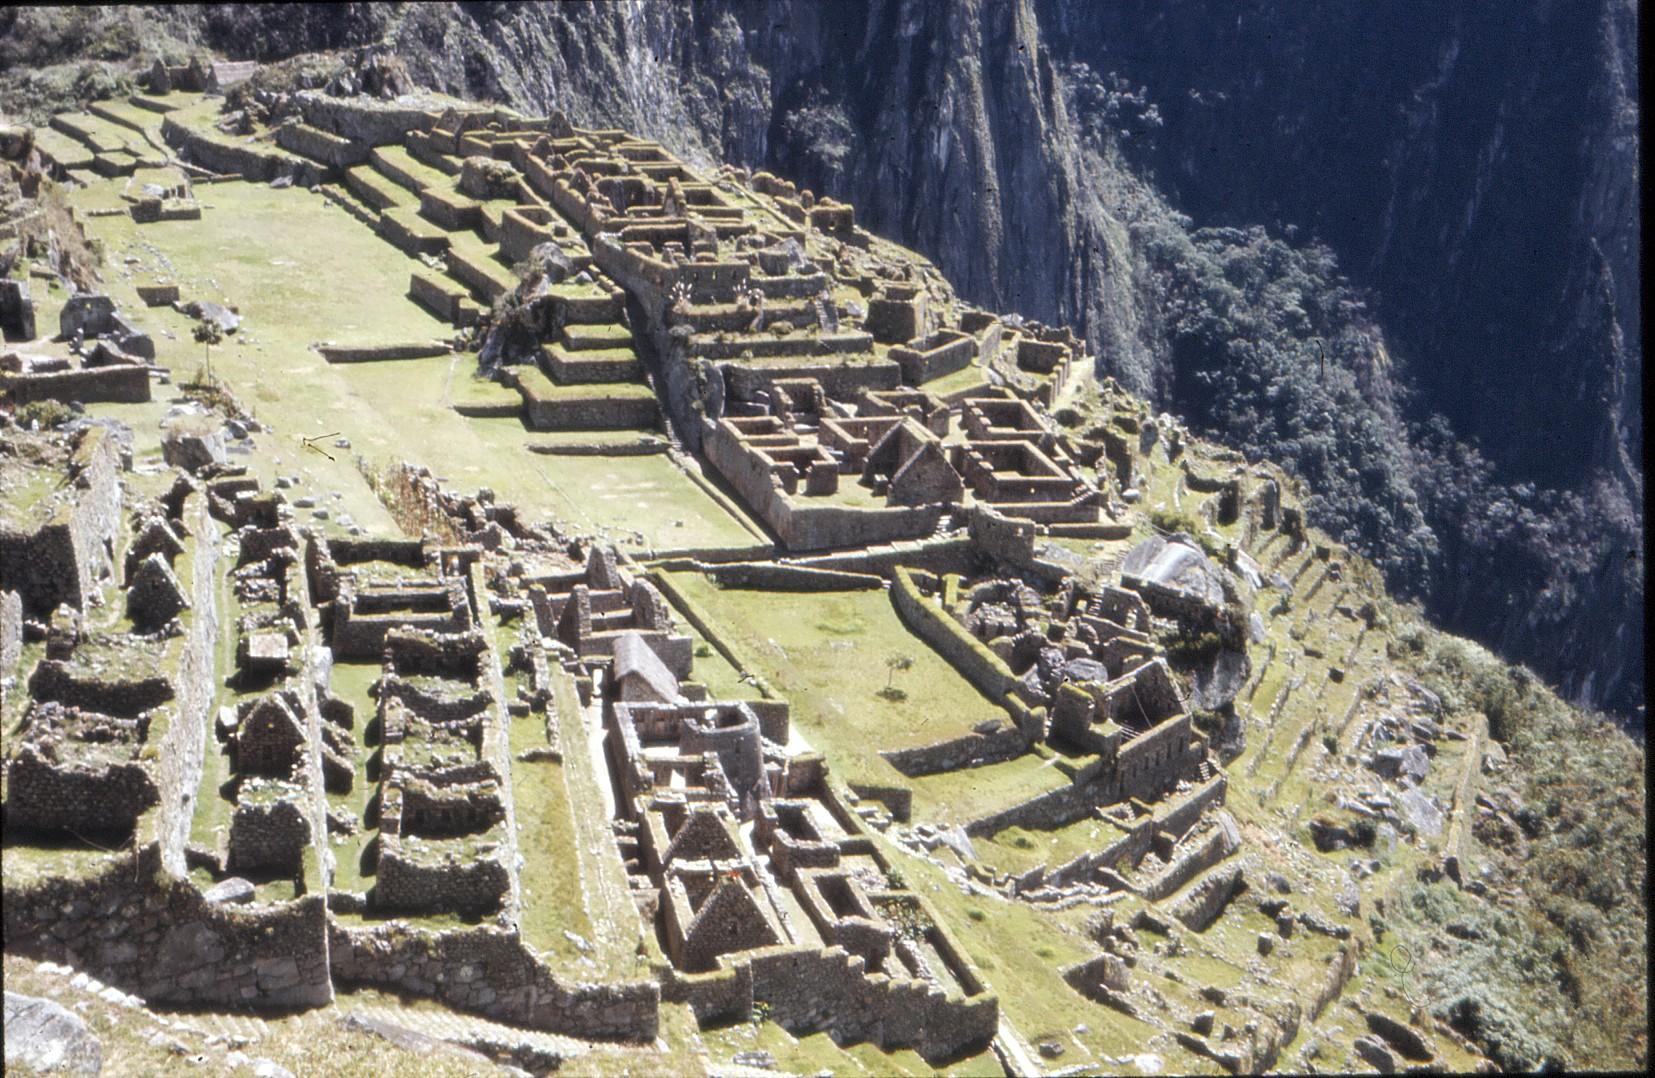 southamerica1972-17